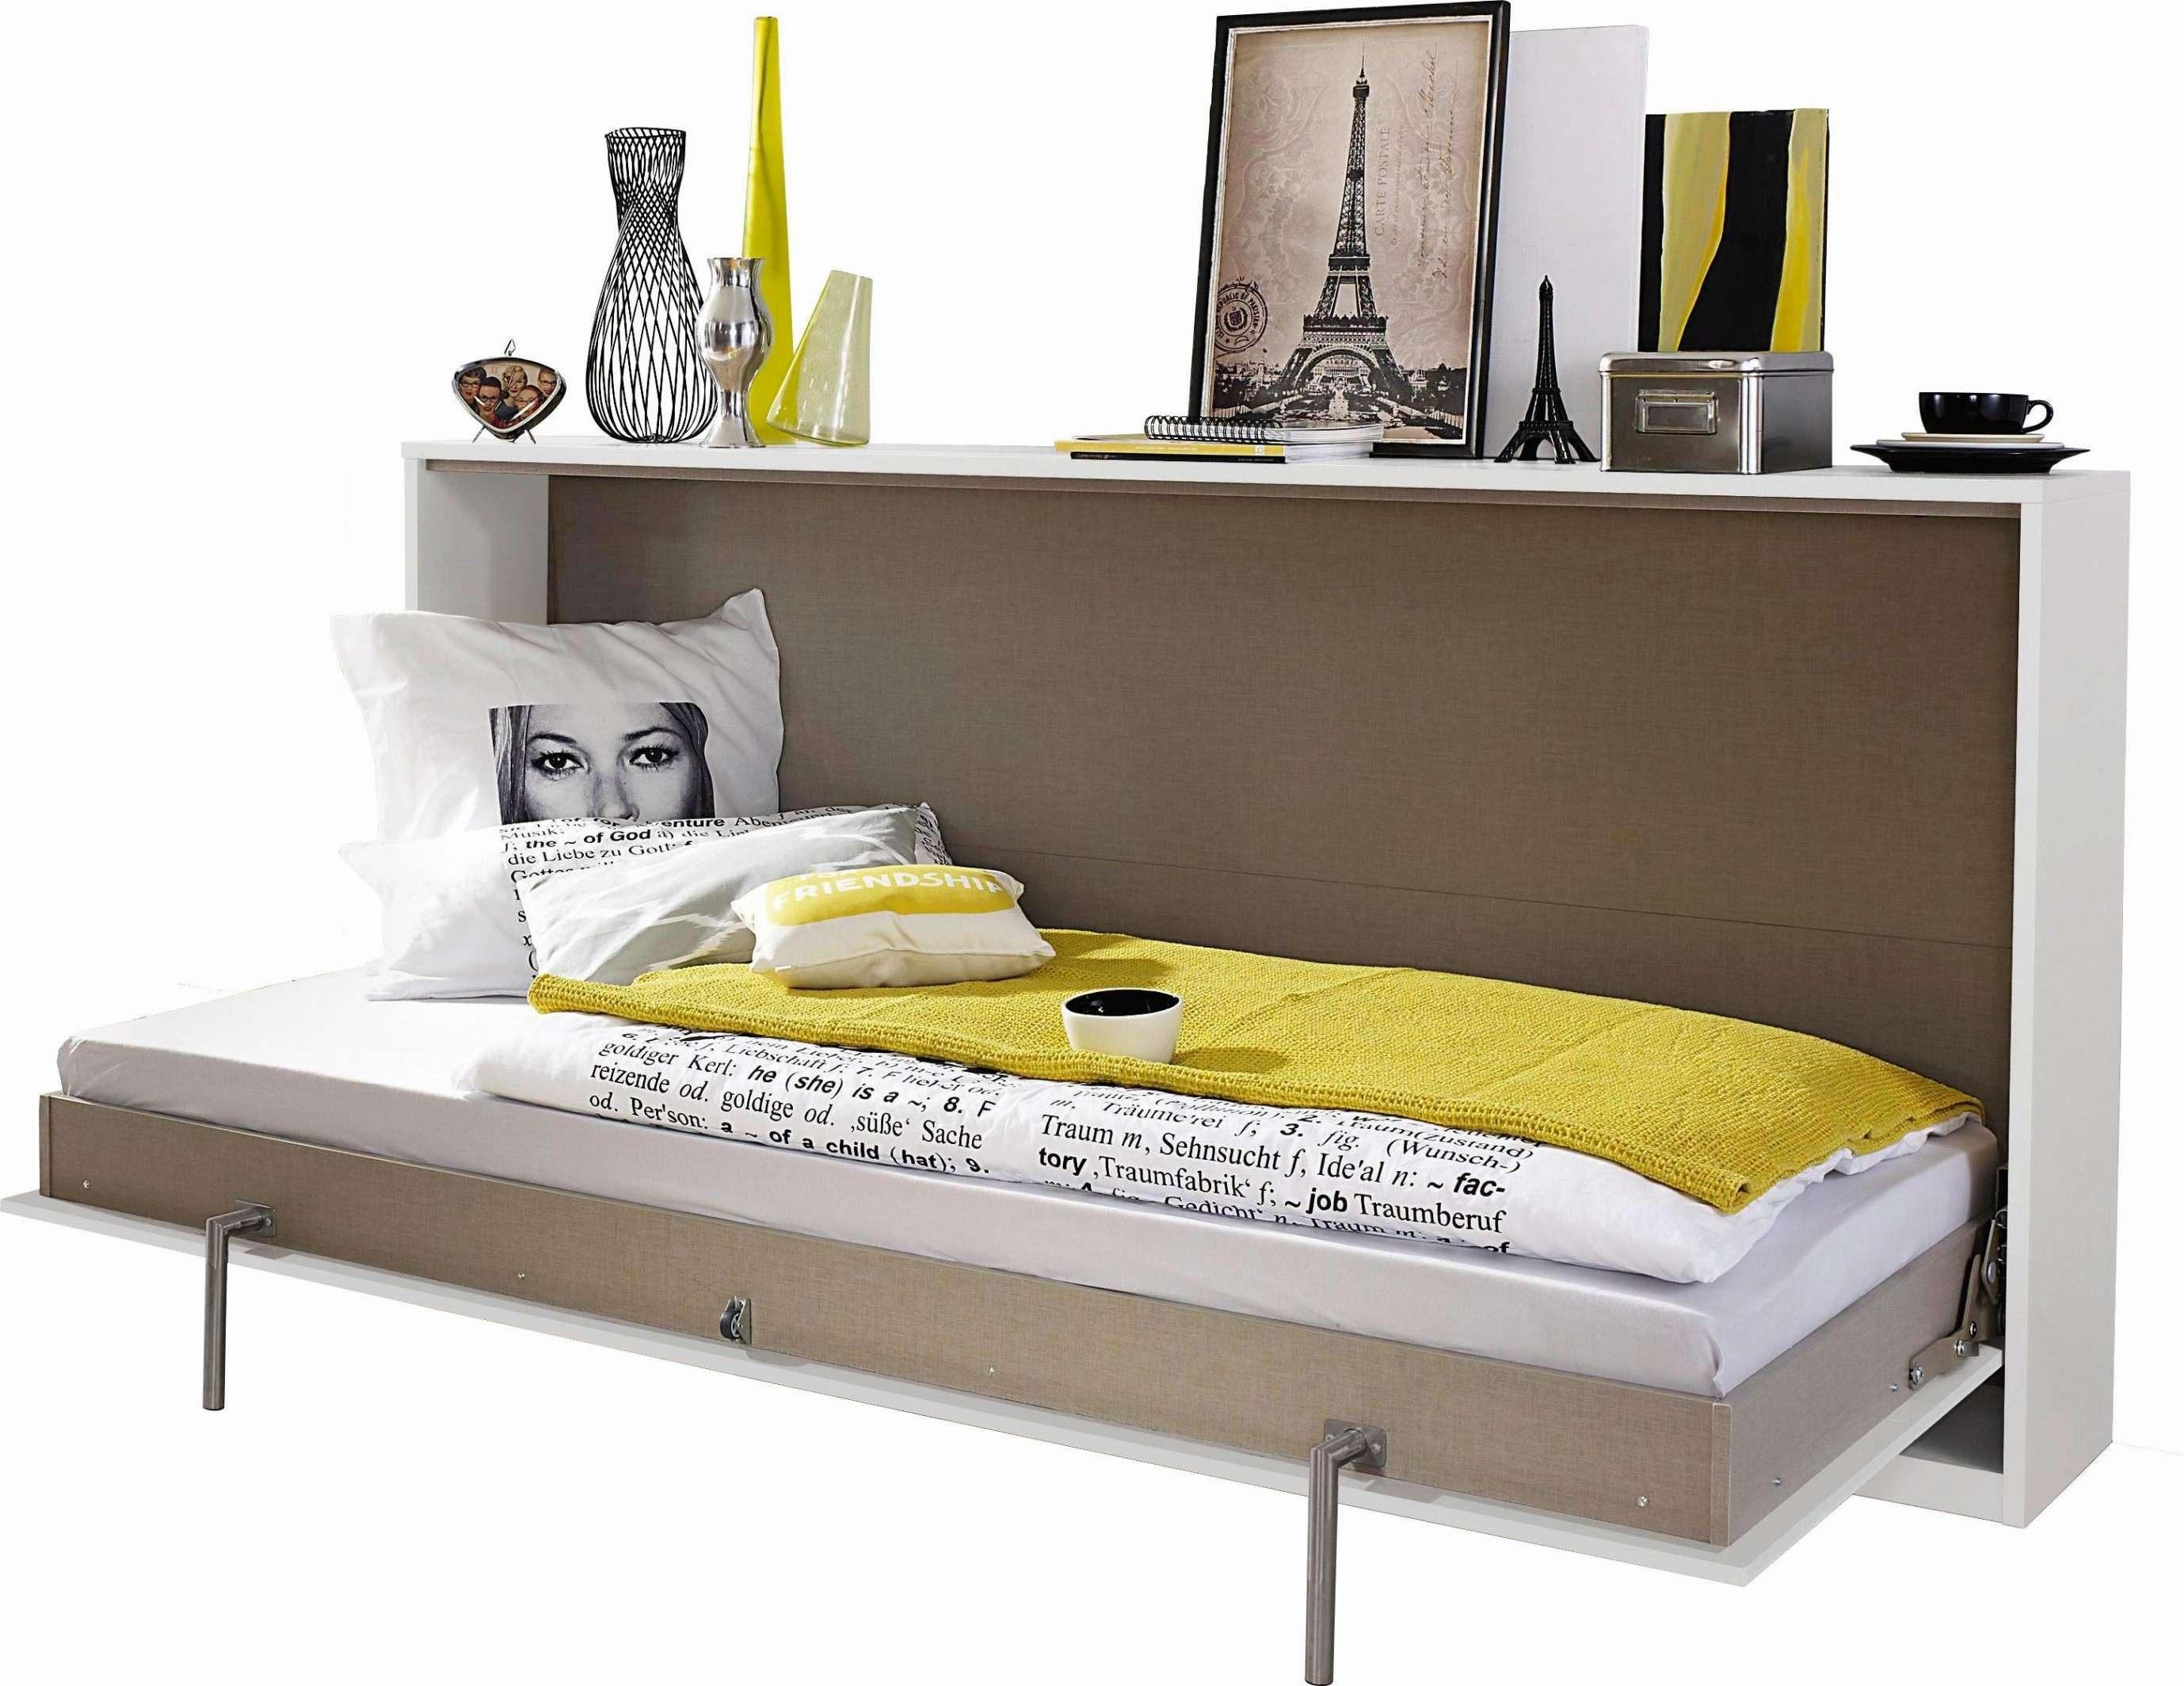 Ikea Malm Tete De Lit Charmant Tete De Lit Ikea 180 Tete De Lit Led élégant 30 élégant De Spot A